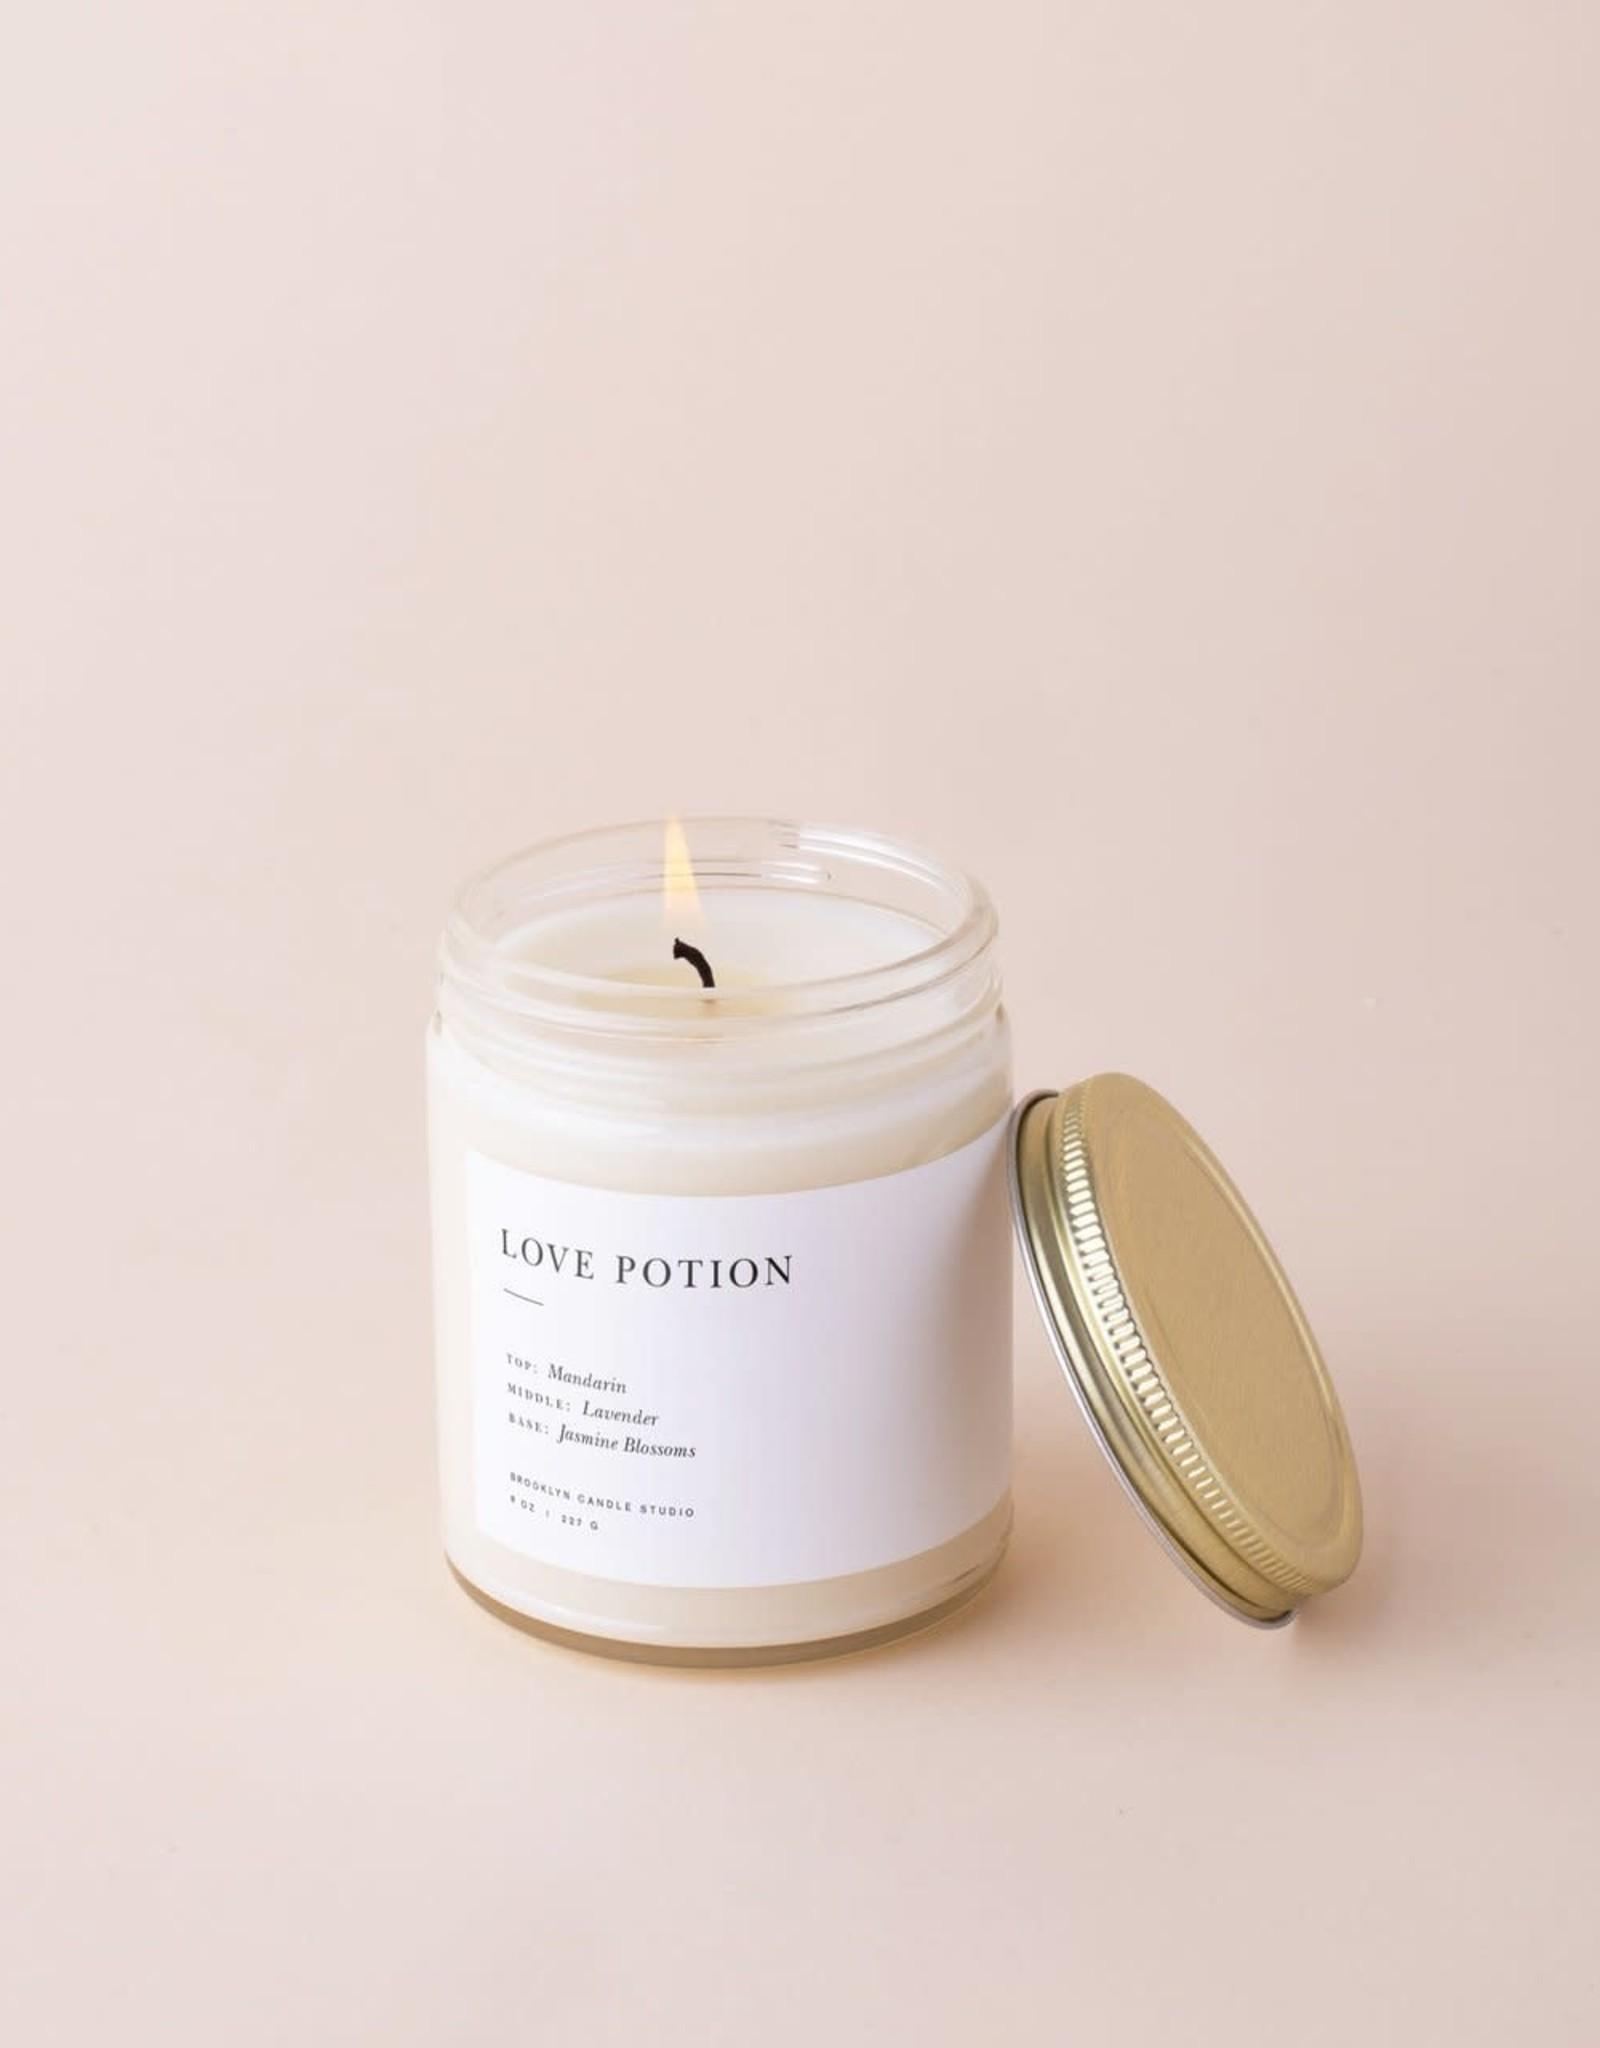 Love Potion Minimalist Candle - 8 oz.